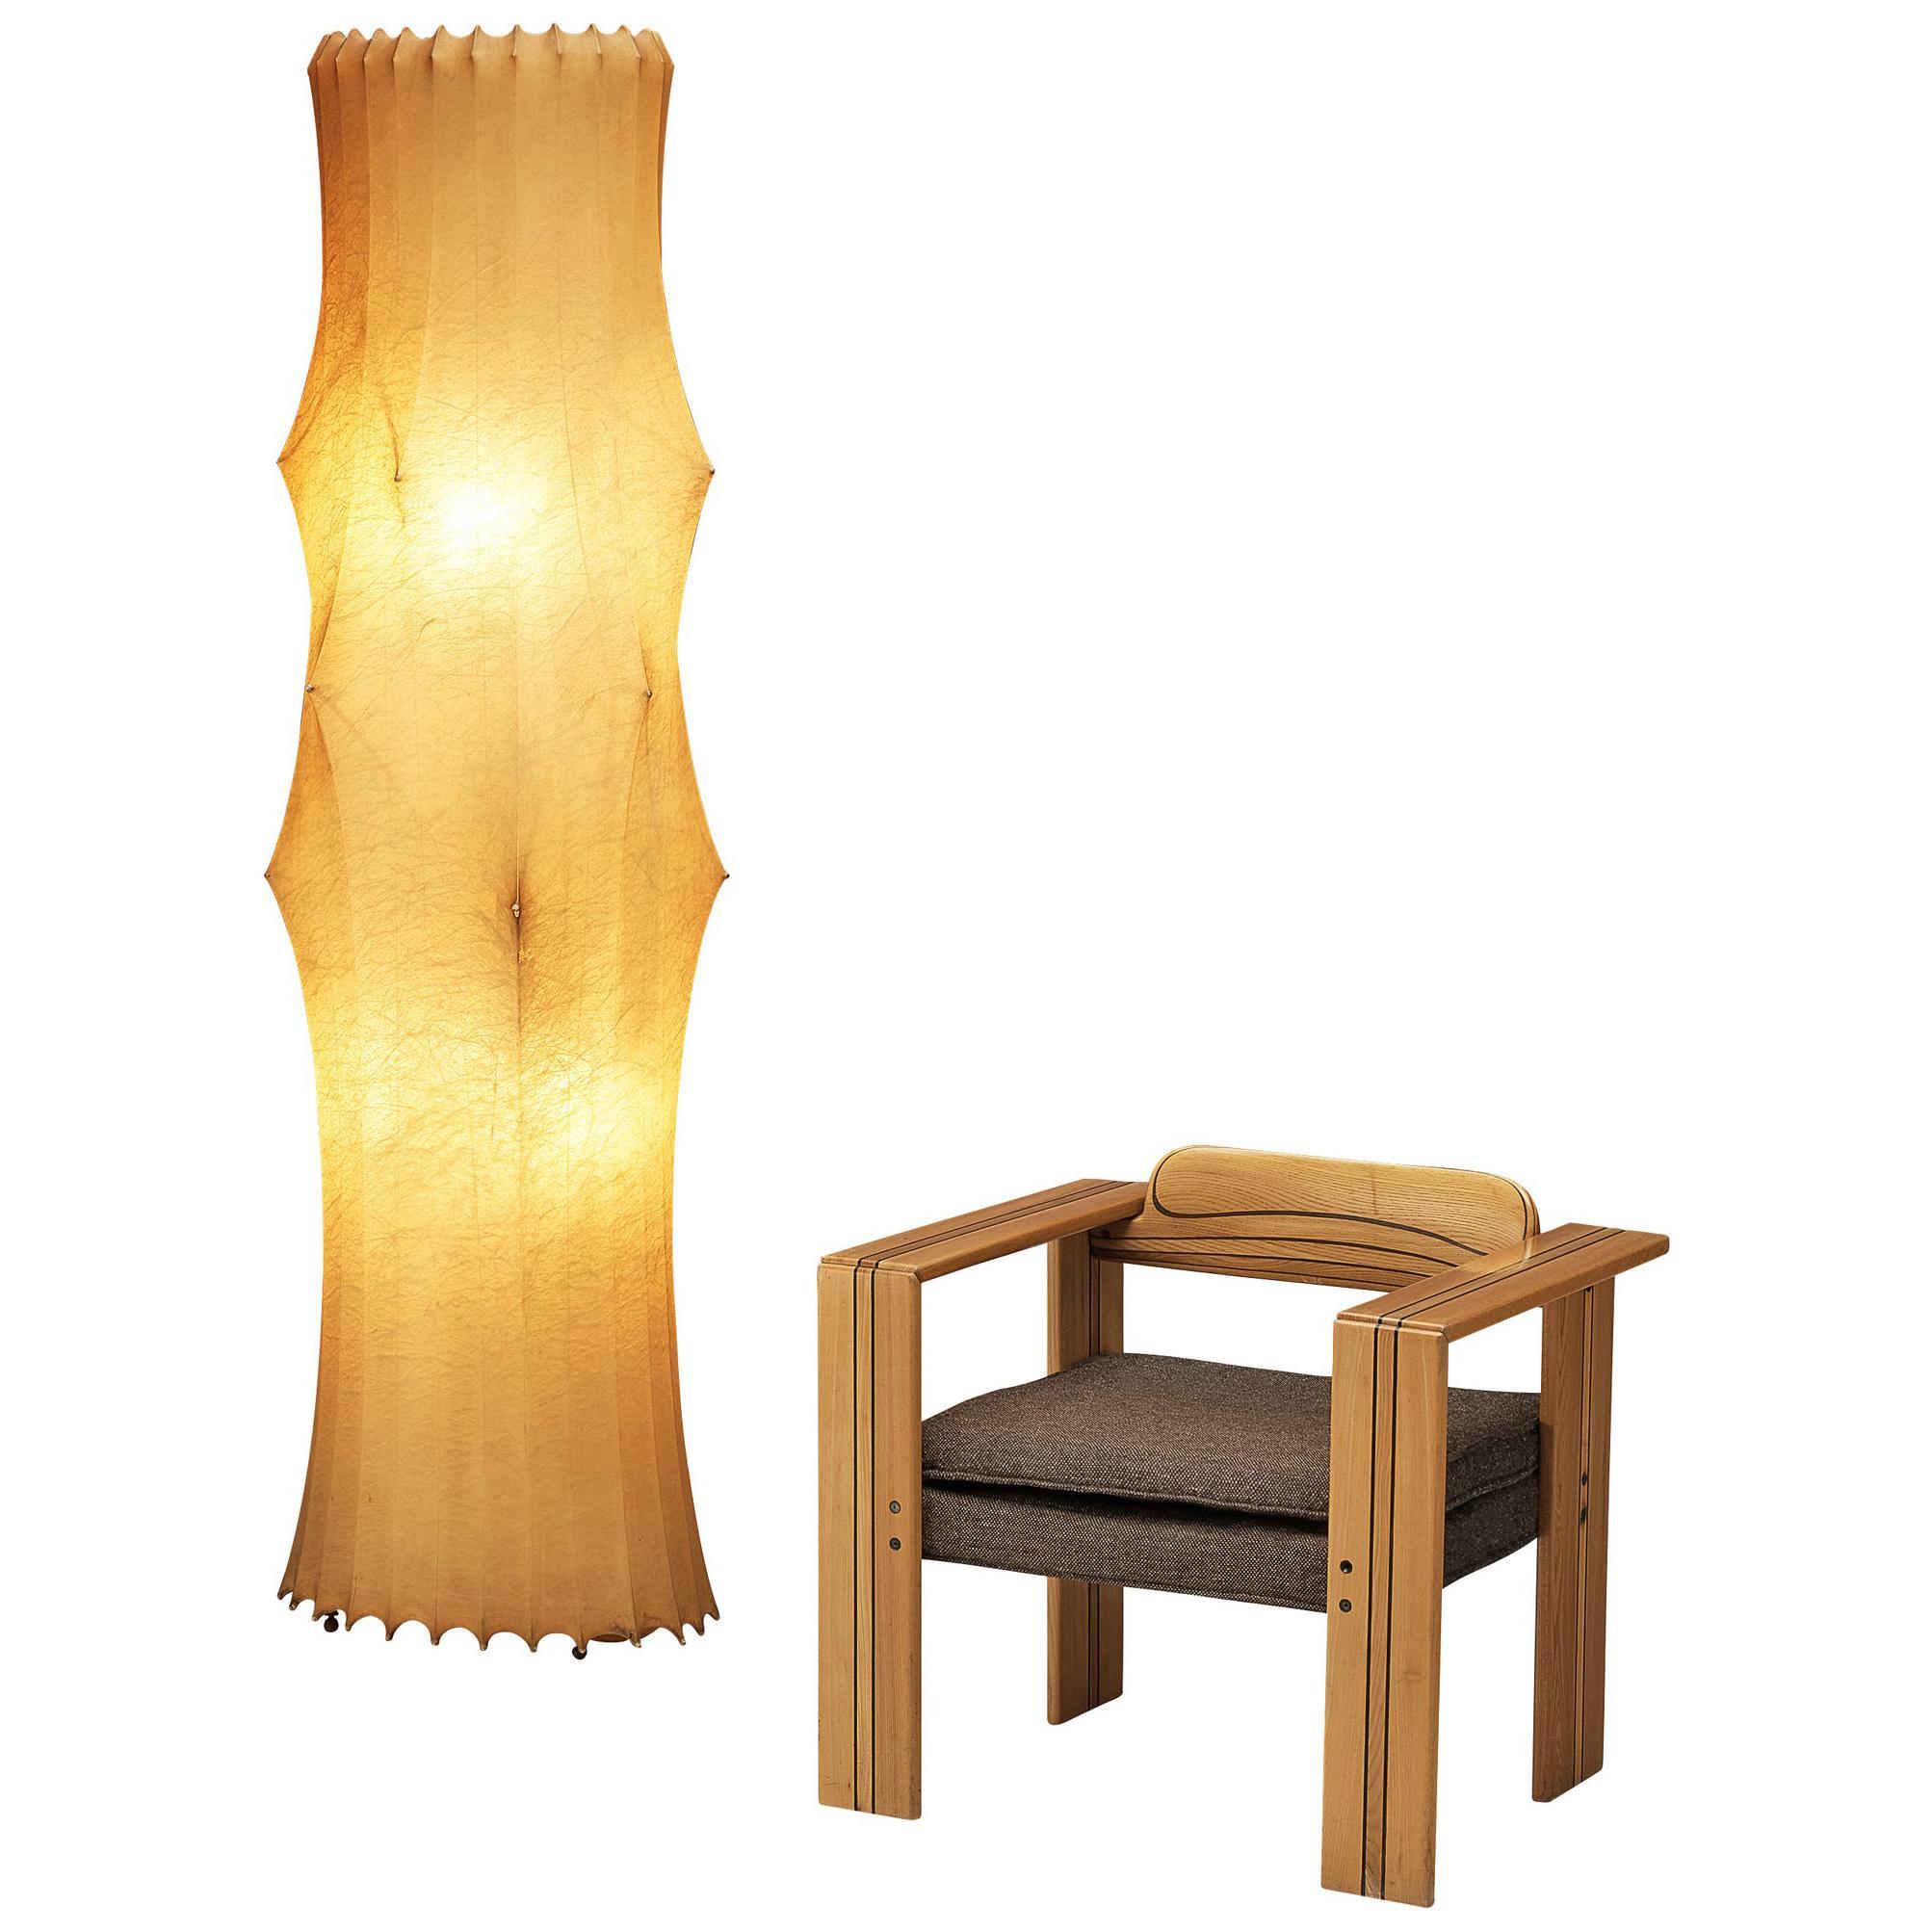 Afra & Tobia Scarpa 'Artona' Lounge Chair in Walnut and 'Fantasma' Floor Lamp